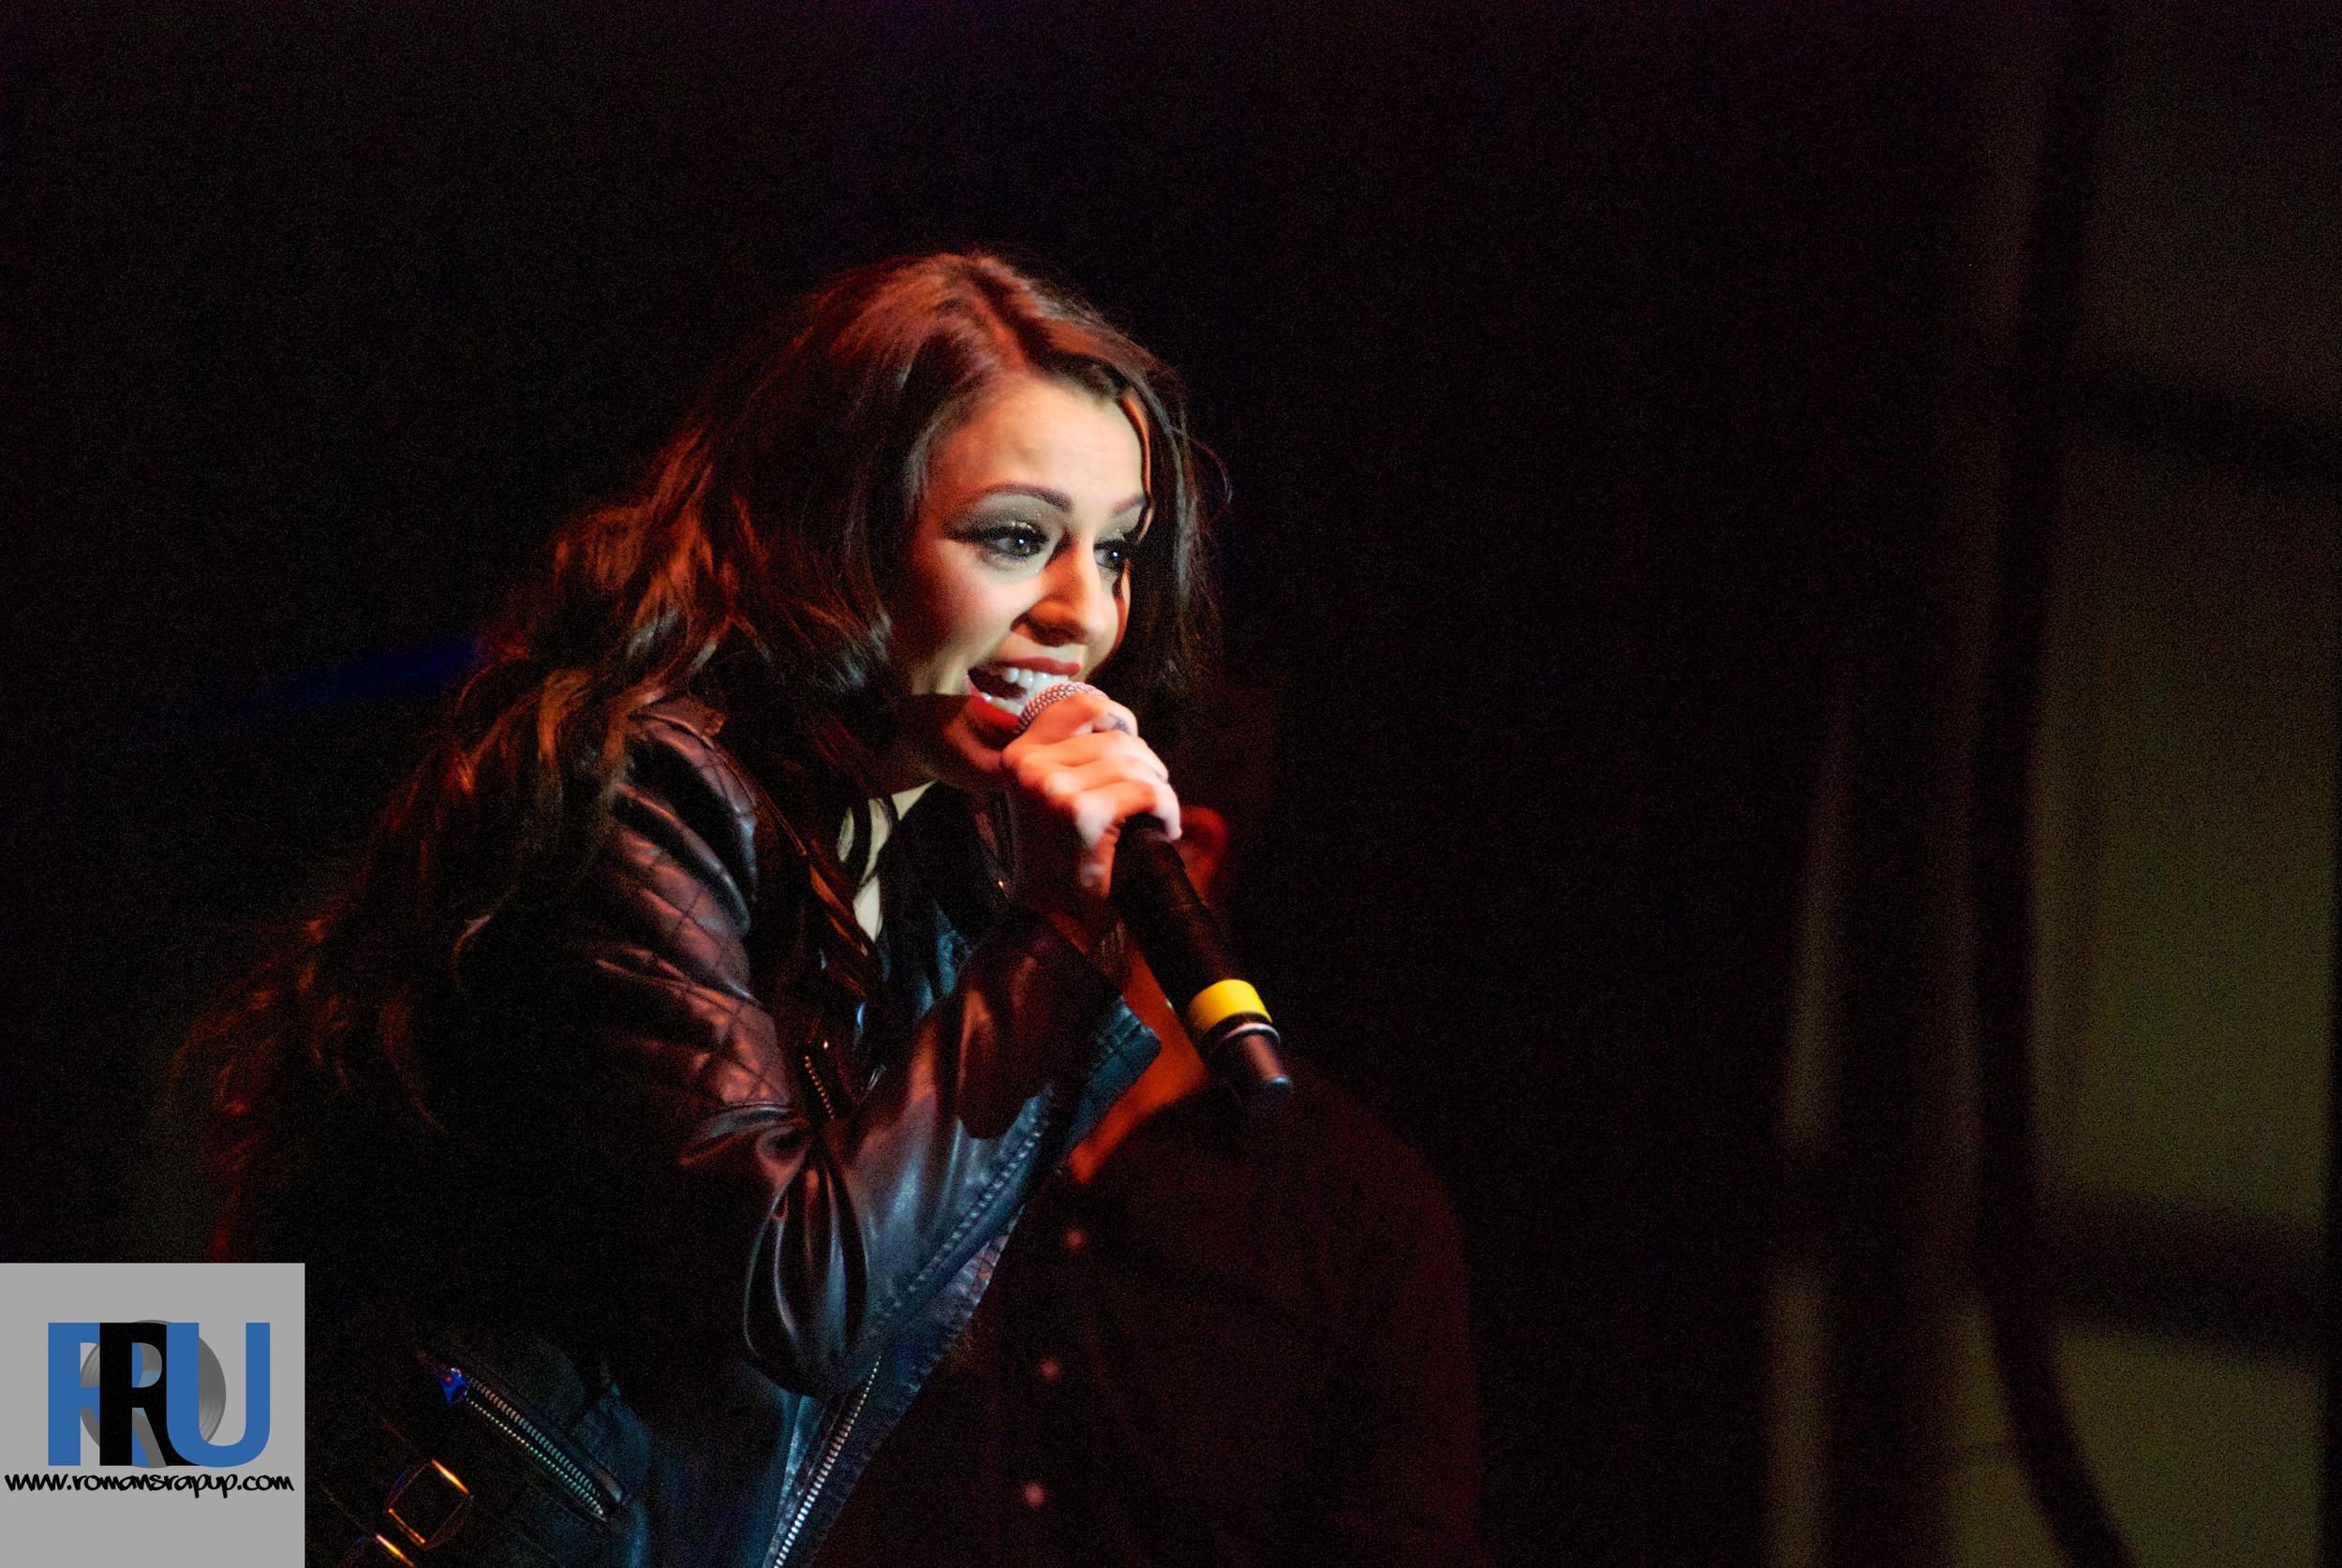 Cher Lloyd Topsfield Fair 10-12-13 45.jpg